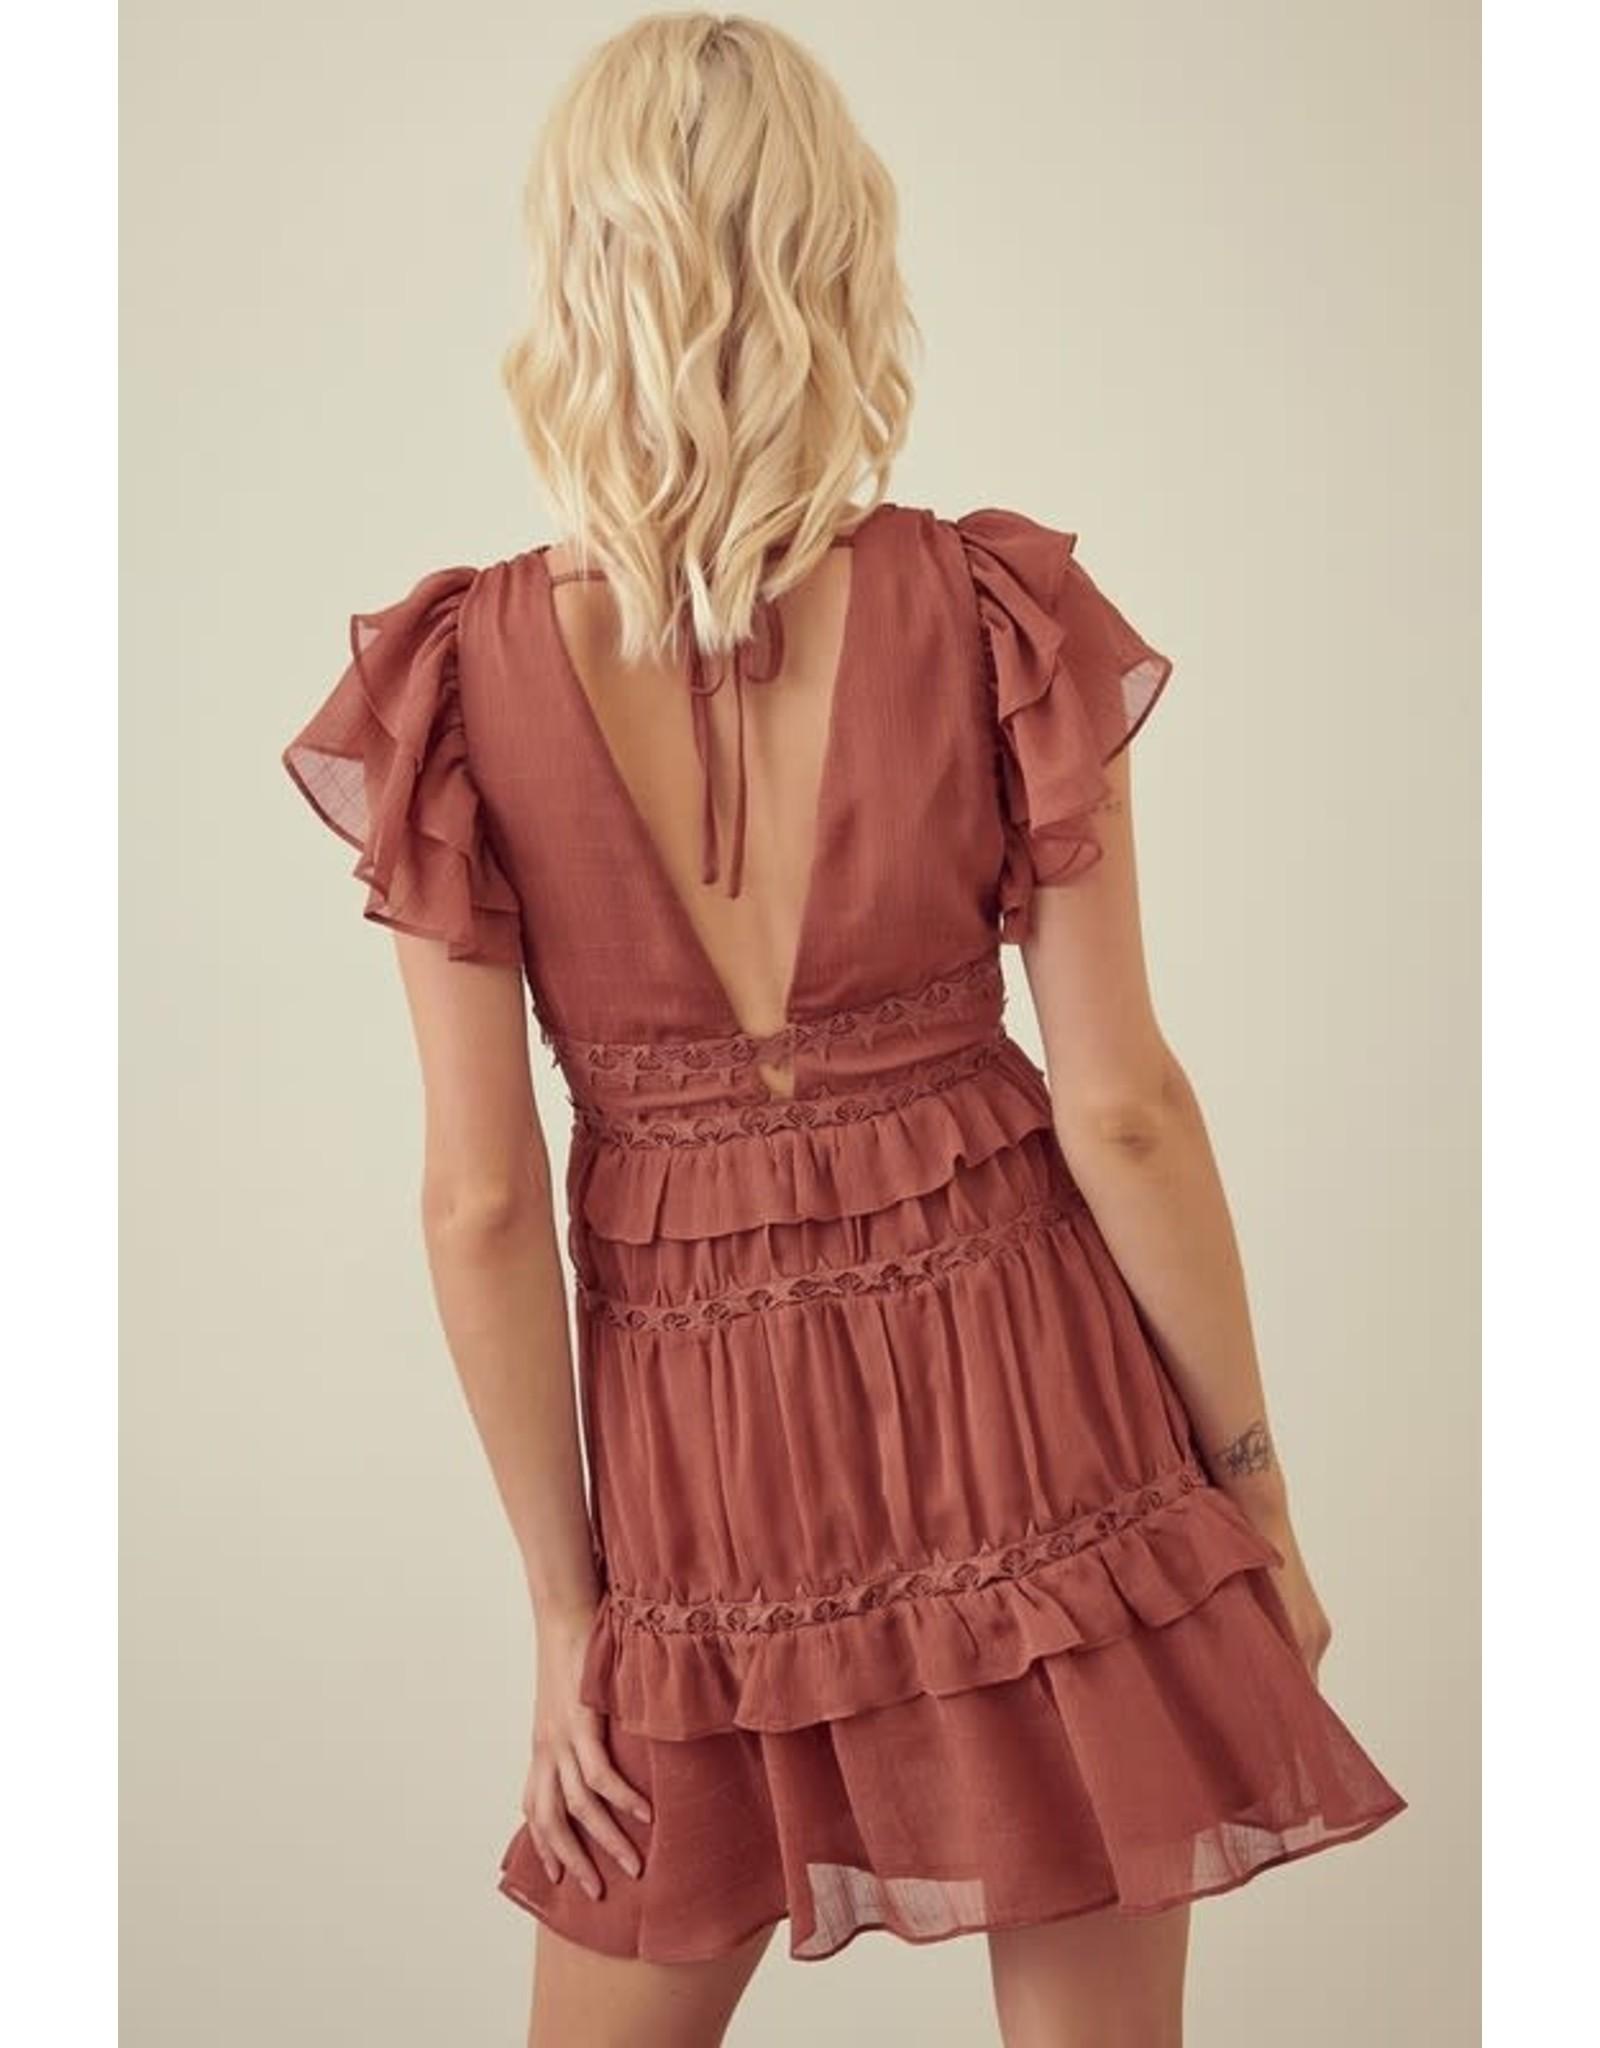 Be My Everything Dress